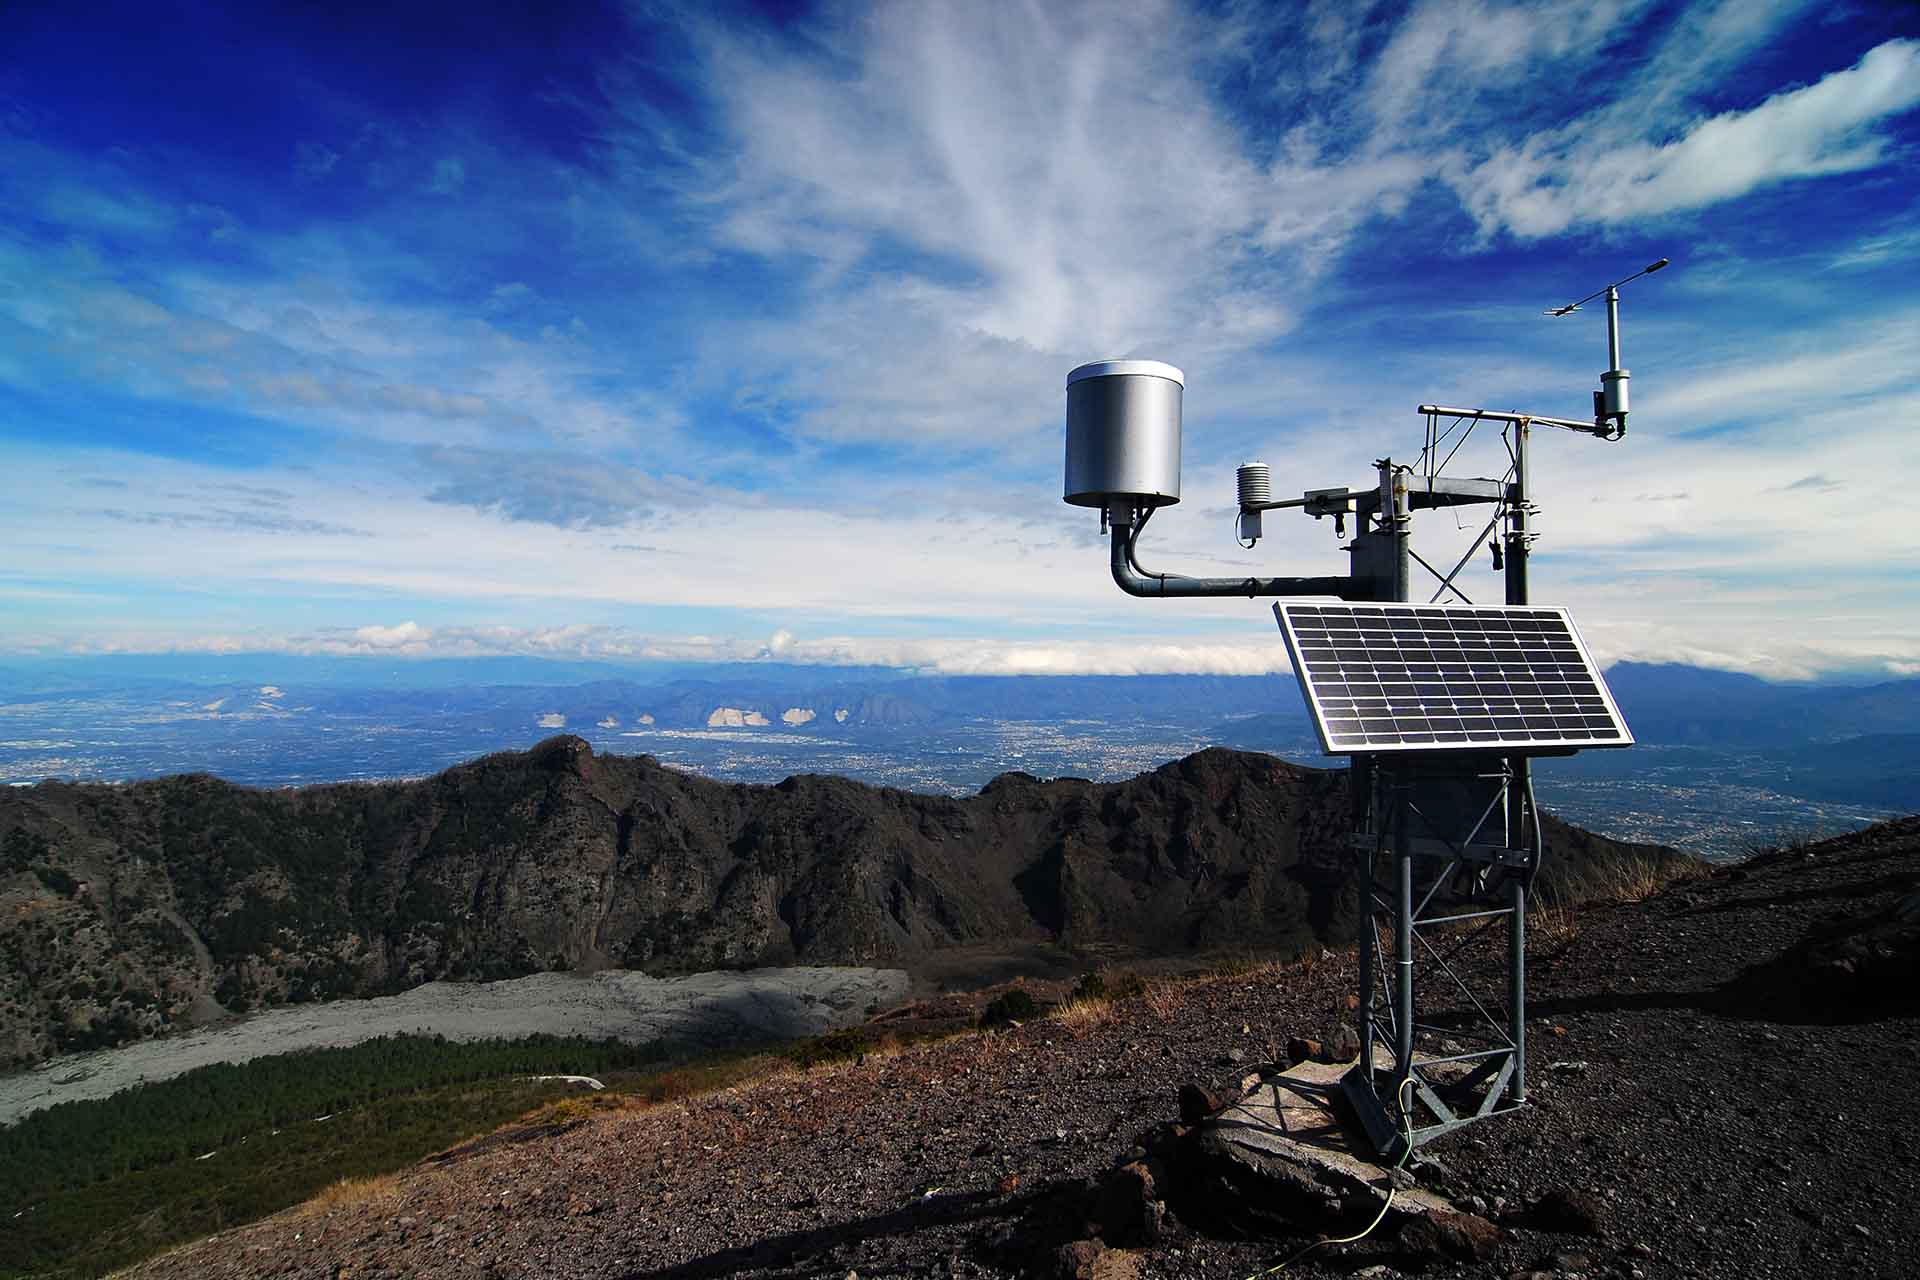 Weather station on Mount Vesuvius 2437693238